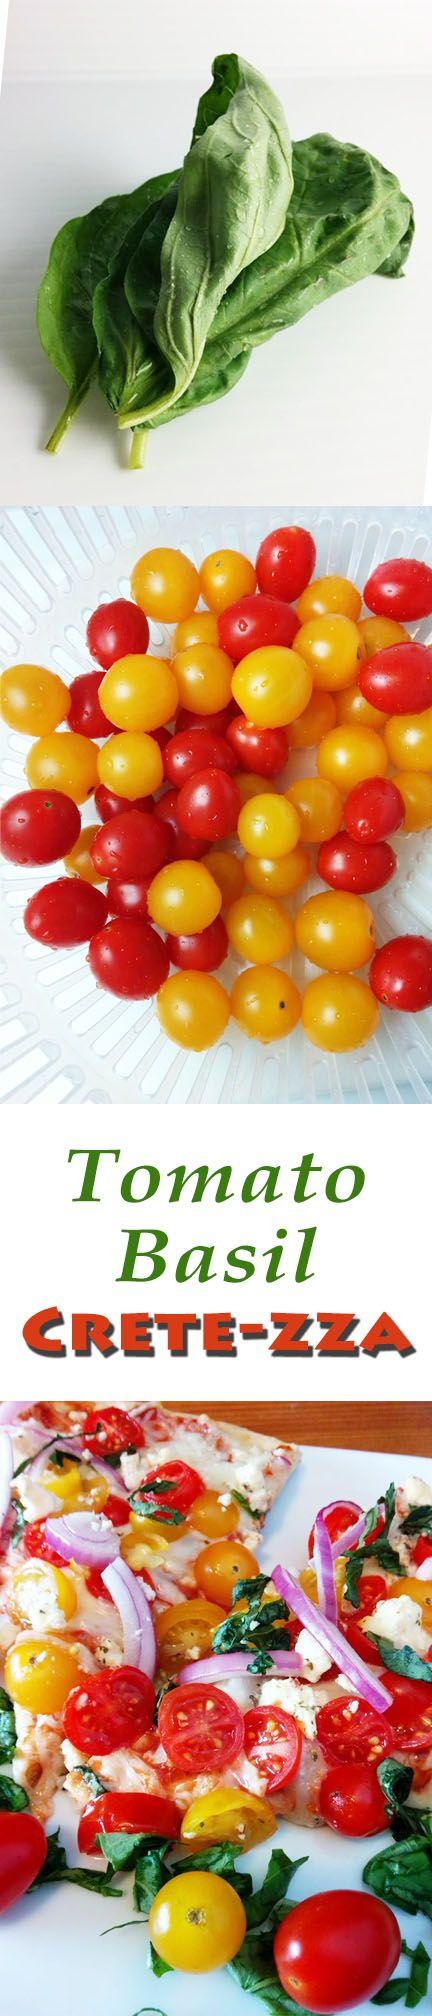 Vegetarian #flatbread #pizza bursting with flavors of the Mediterranean. #tomato #basil #feta